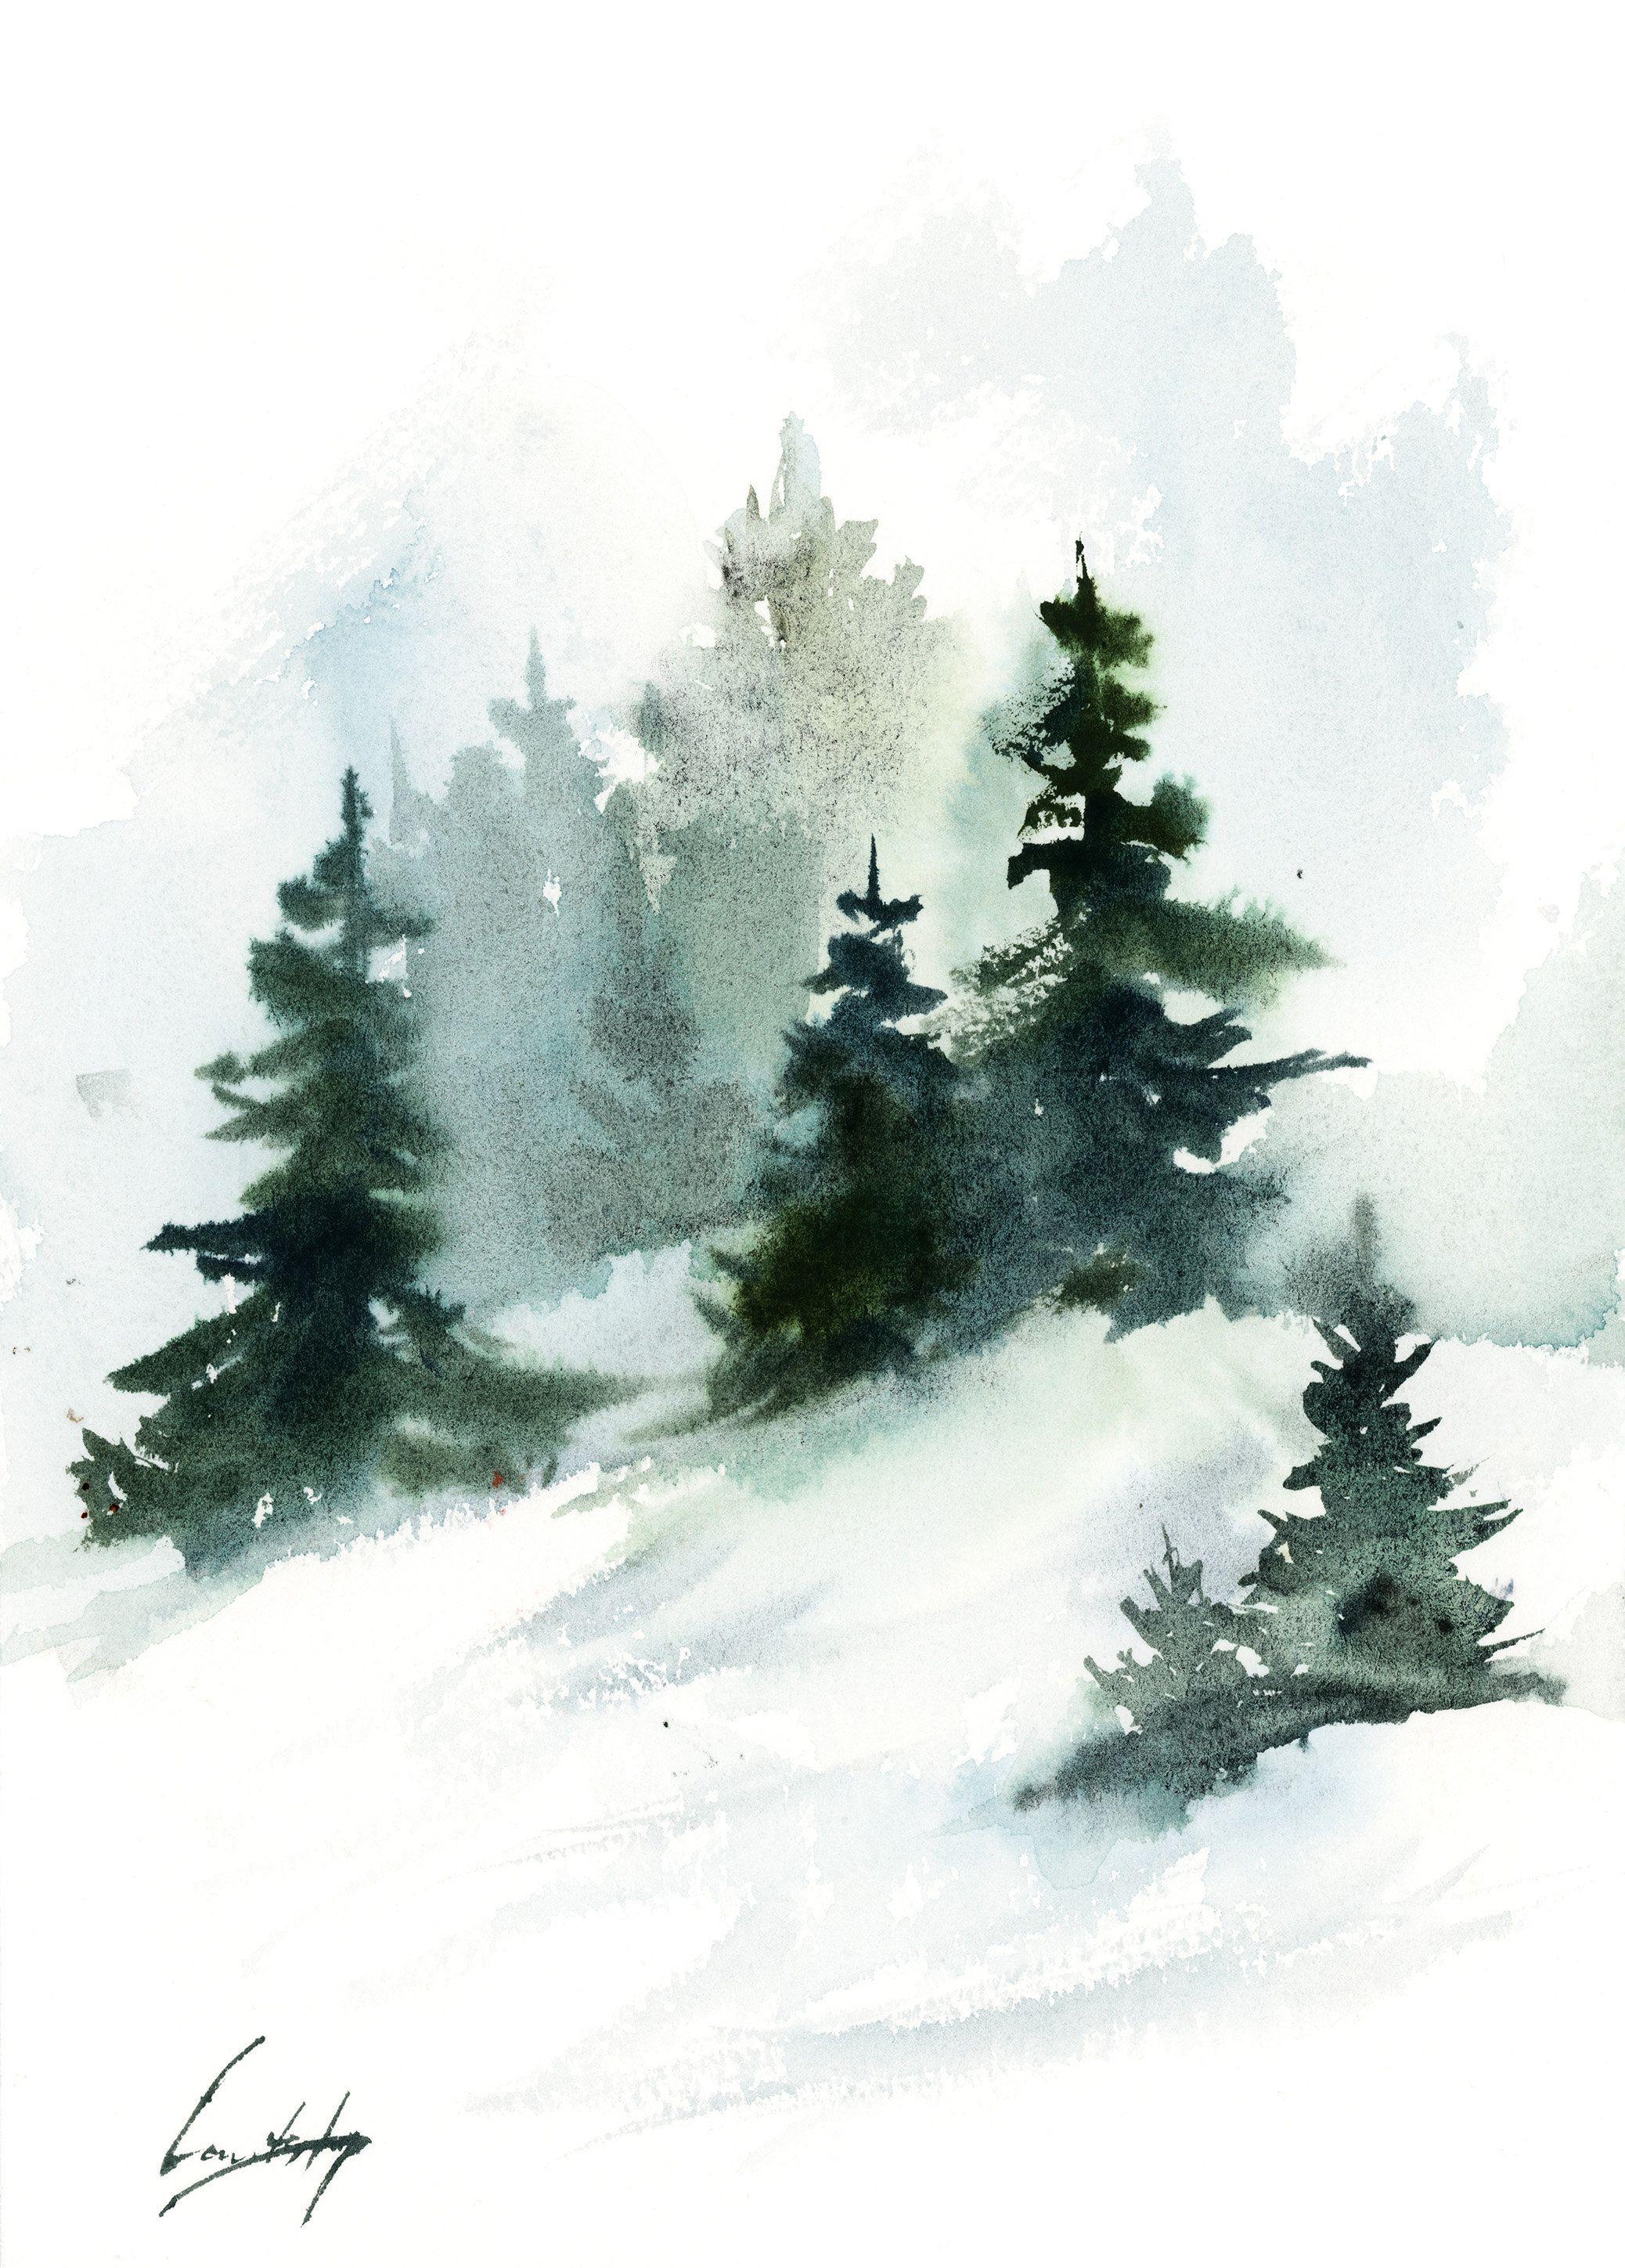 Pine Trees Landscape Painting Winter Landscape Original Watercolor Painting Snowy Nature Painting By Canotstop Pine Tree Painting Nature Paintings Painting Snow